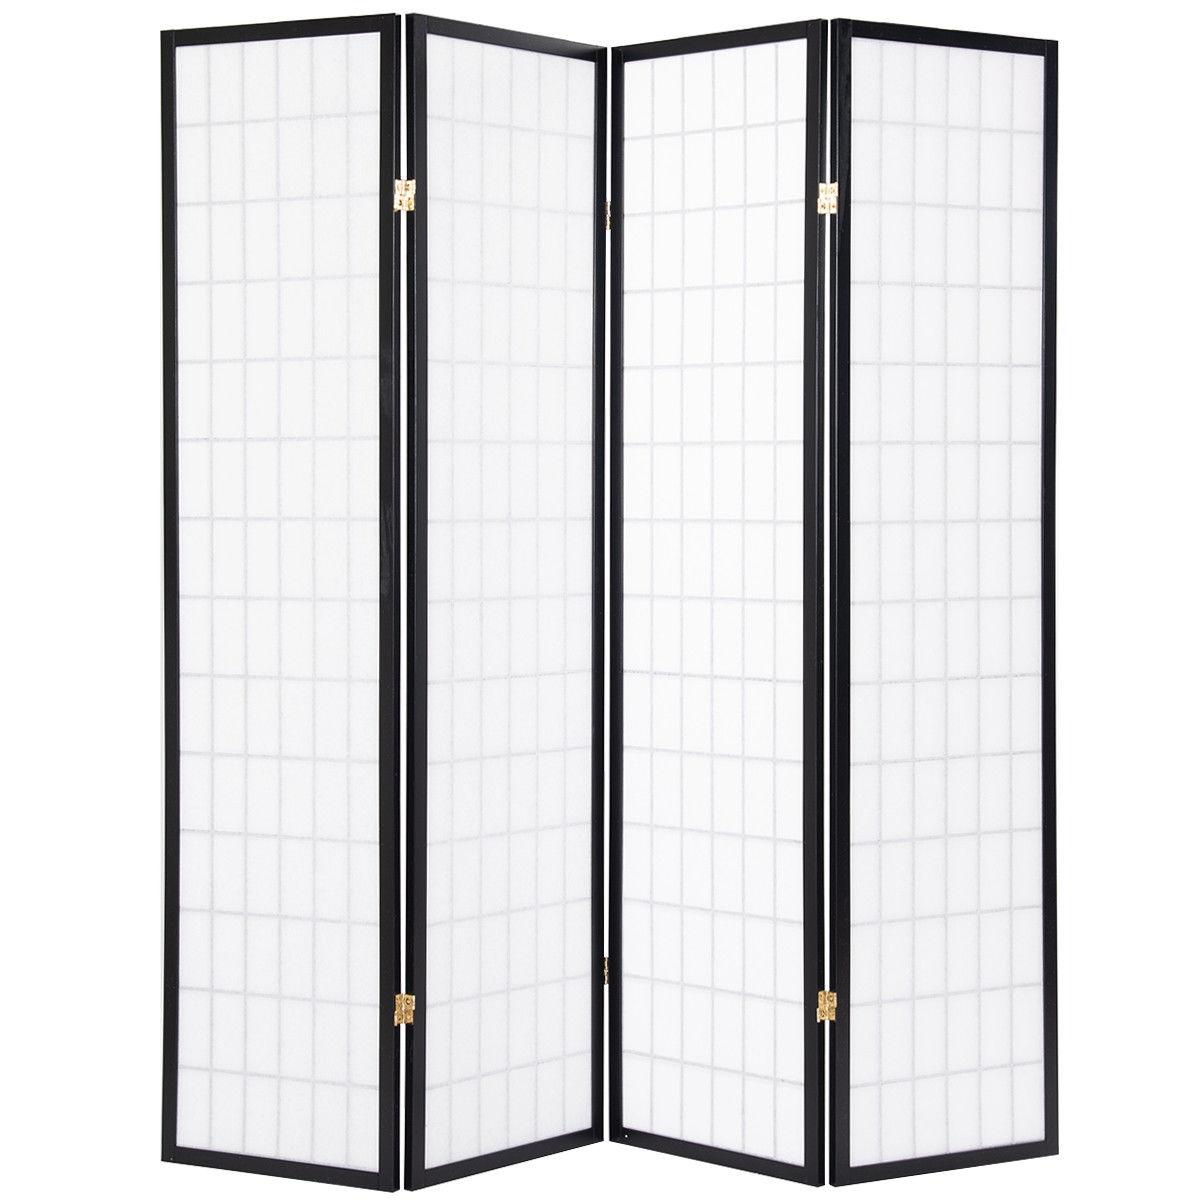 4 Panels Folding Pine Wood Room Divider Shoji Screen